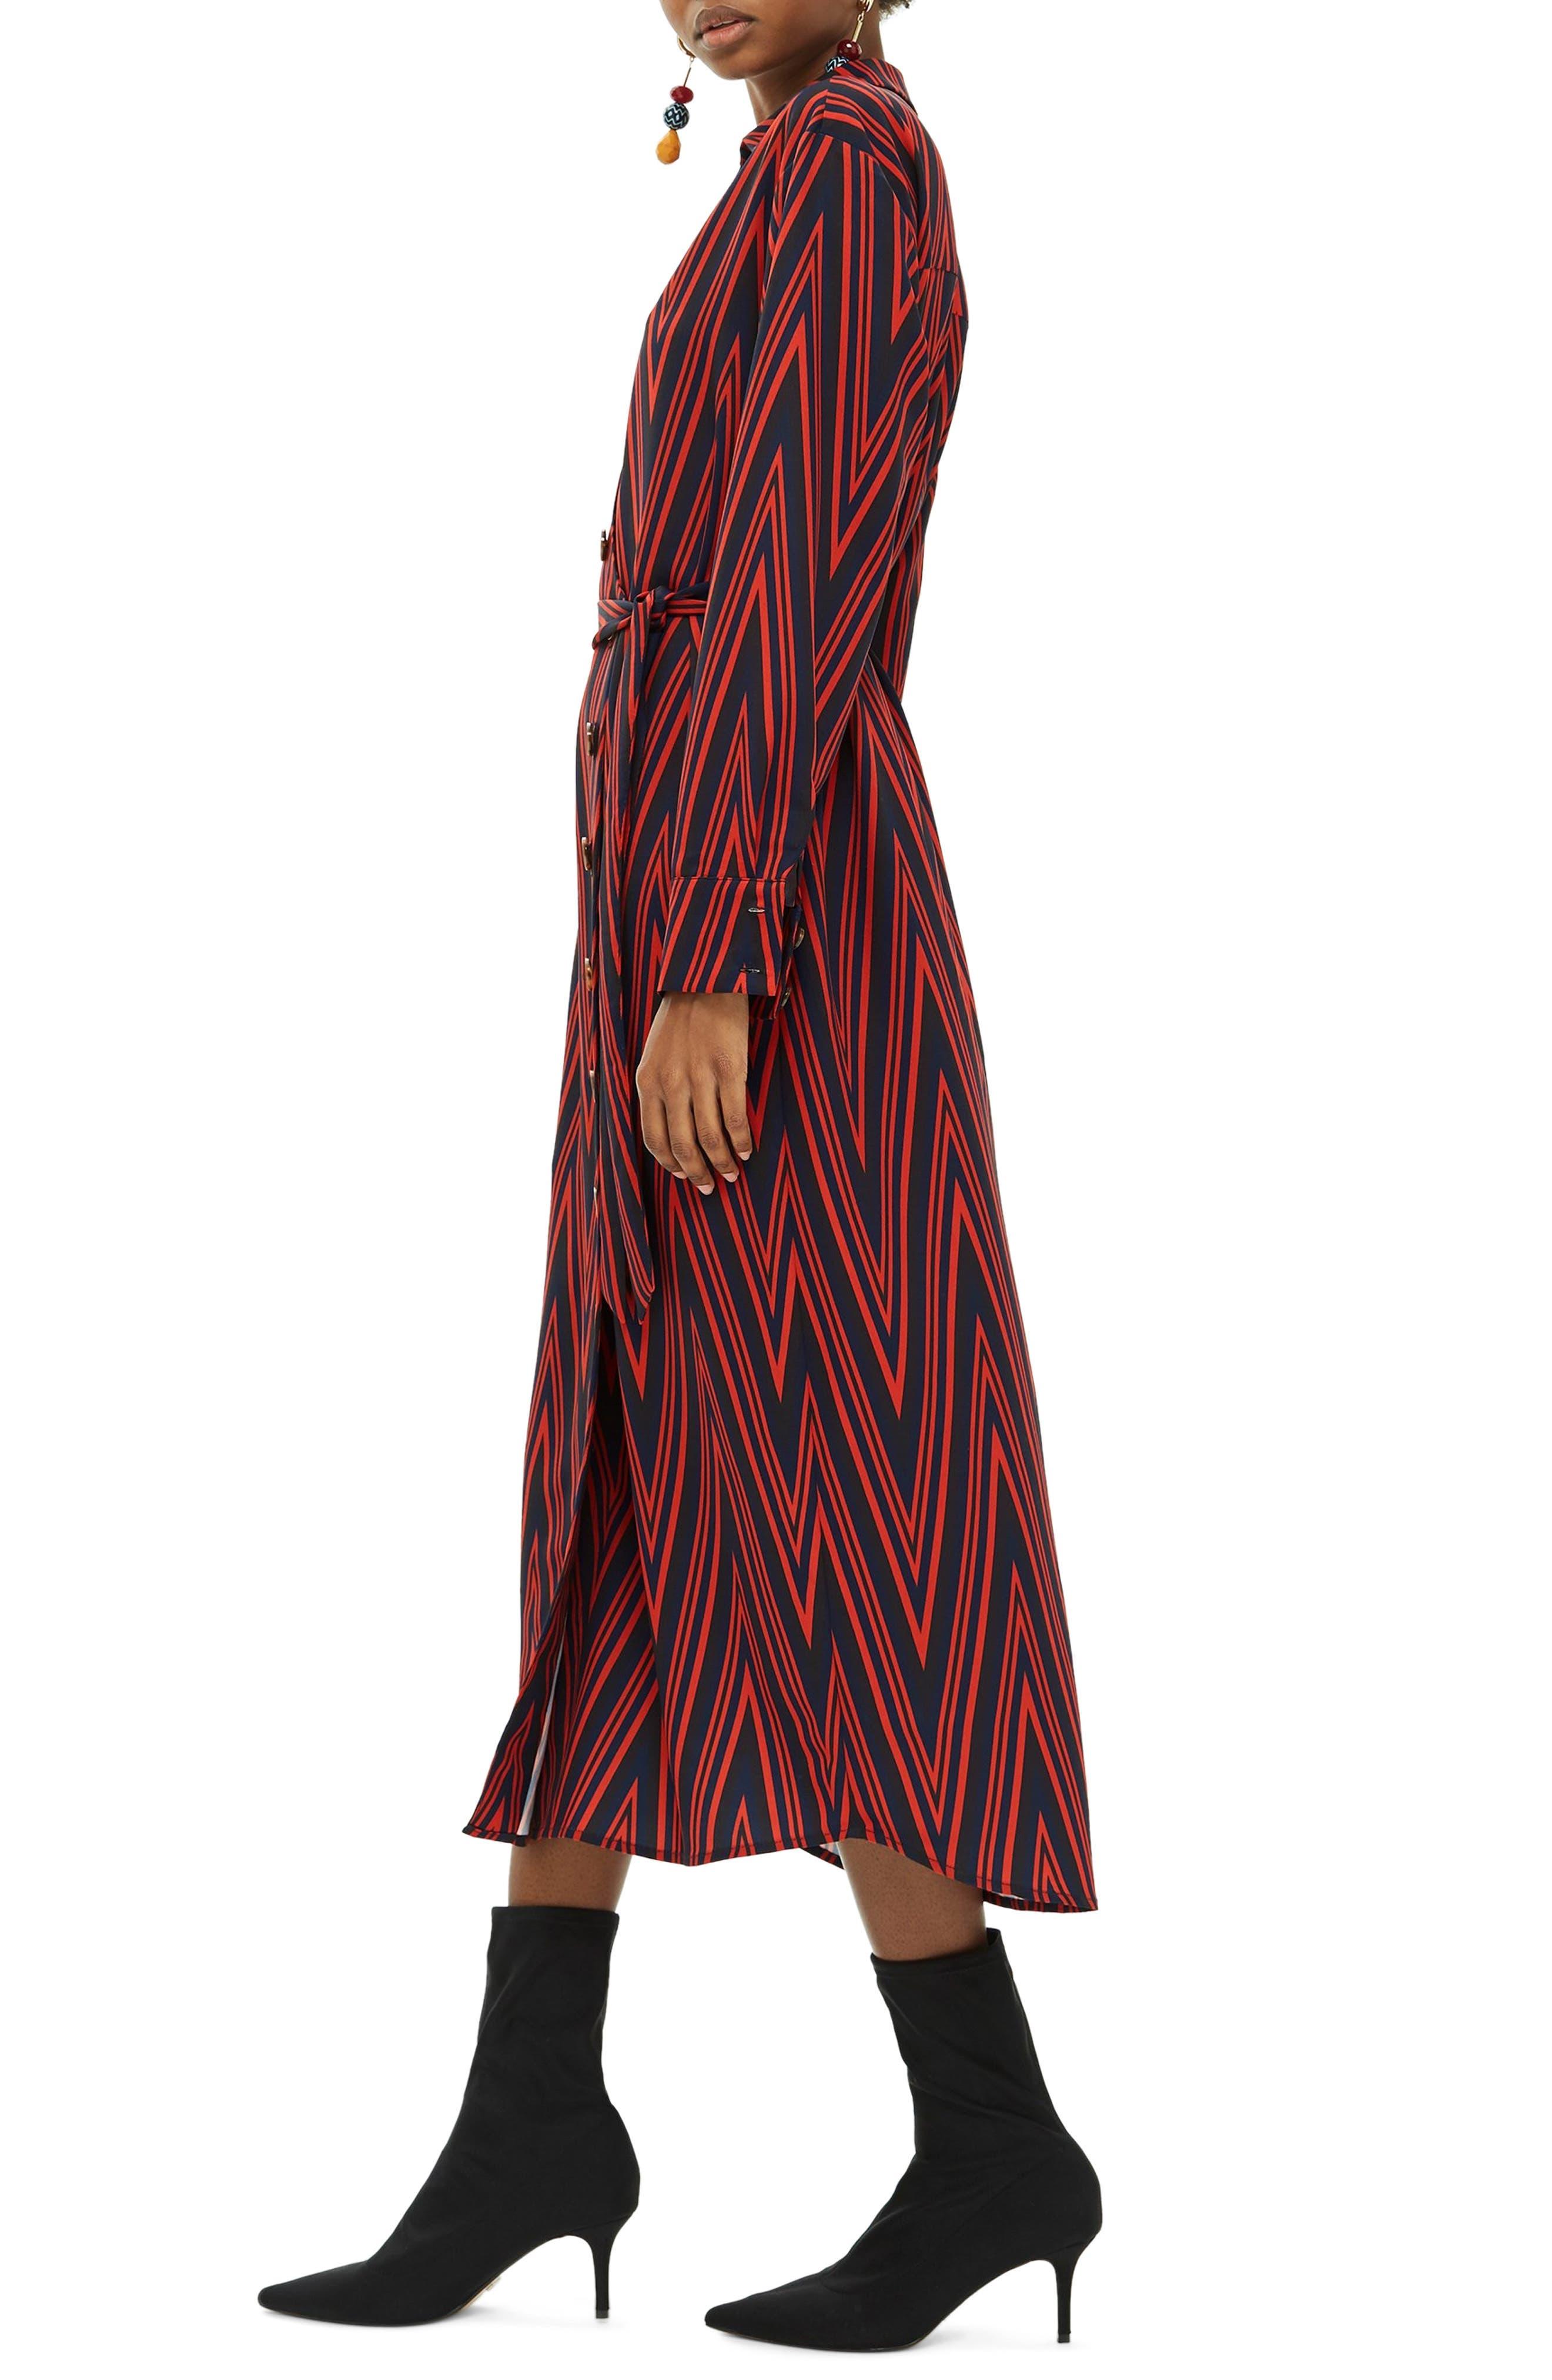 TOPSHOP,                             Horn Button Print Midi Dress,                             Alternate thumbnail 3, color,                             220